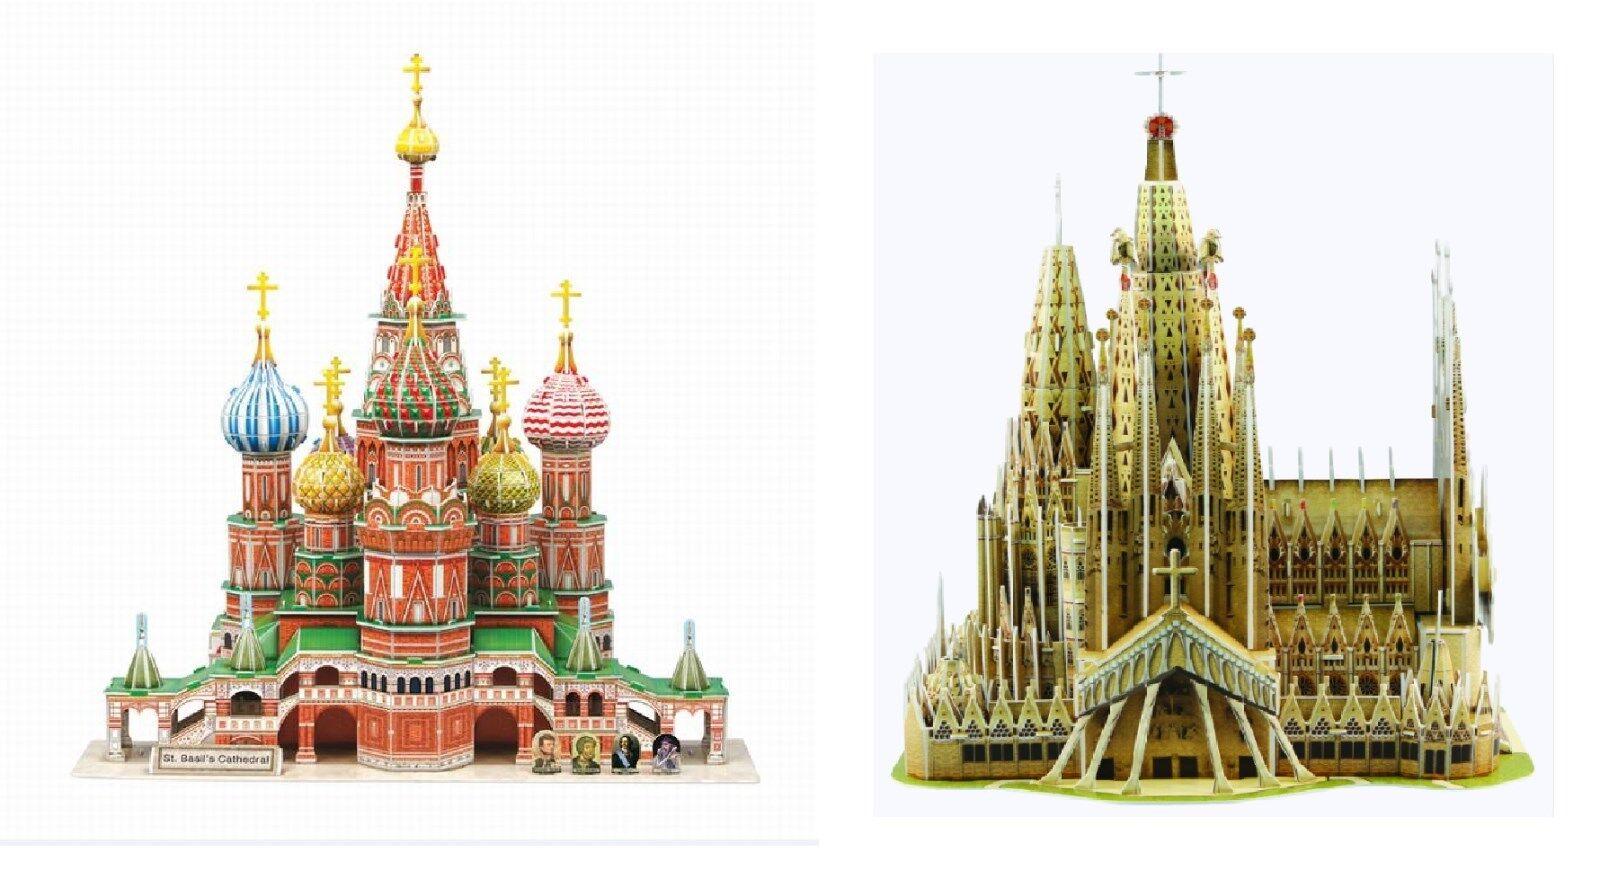 2 pcs 3d - puzzles st. die firma ba lis kathedrale sagrada familia basilika bildung diy +